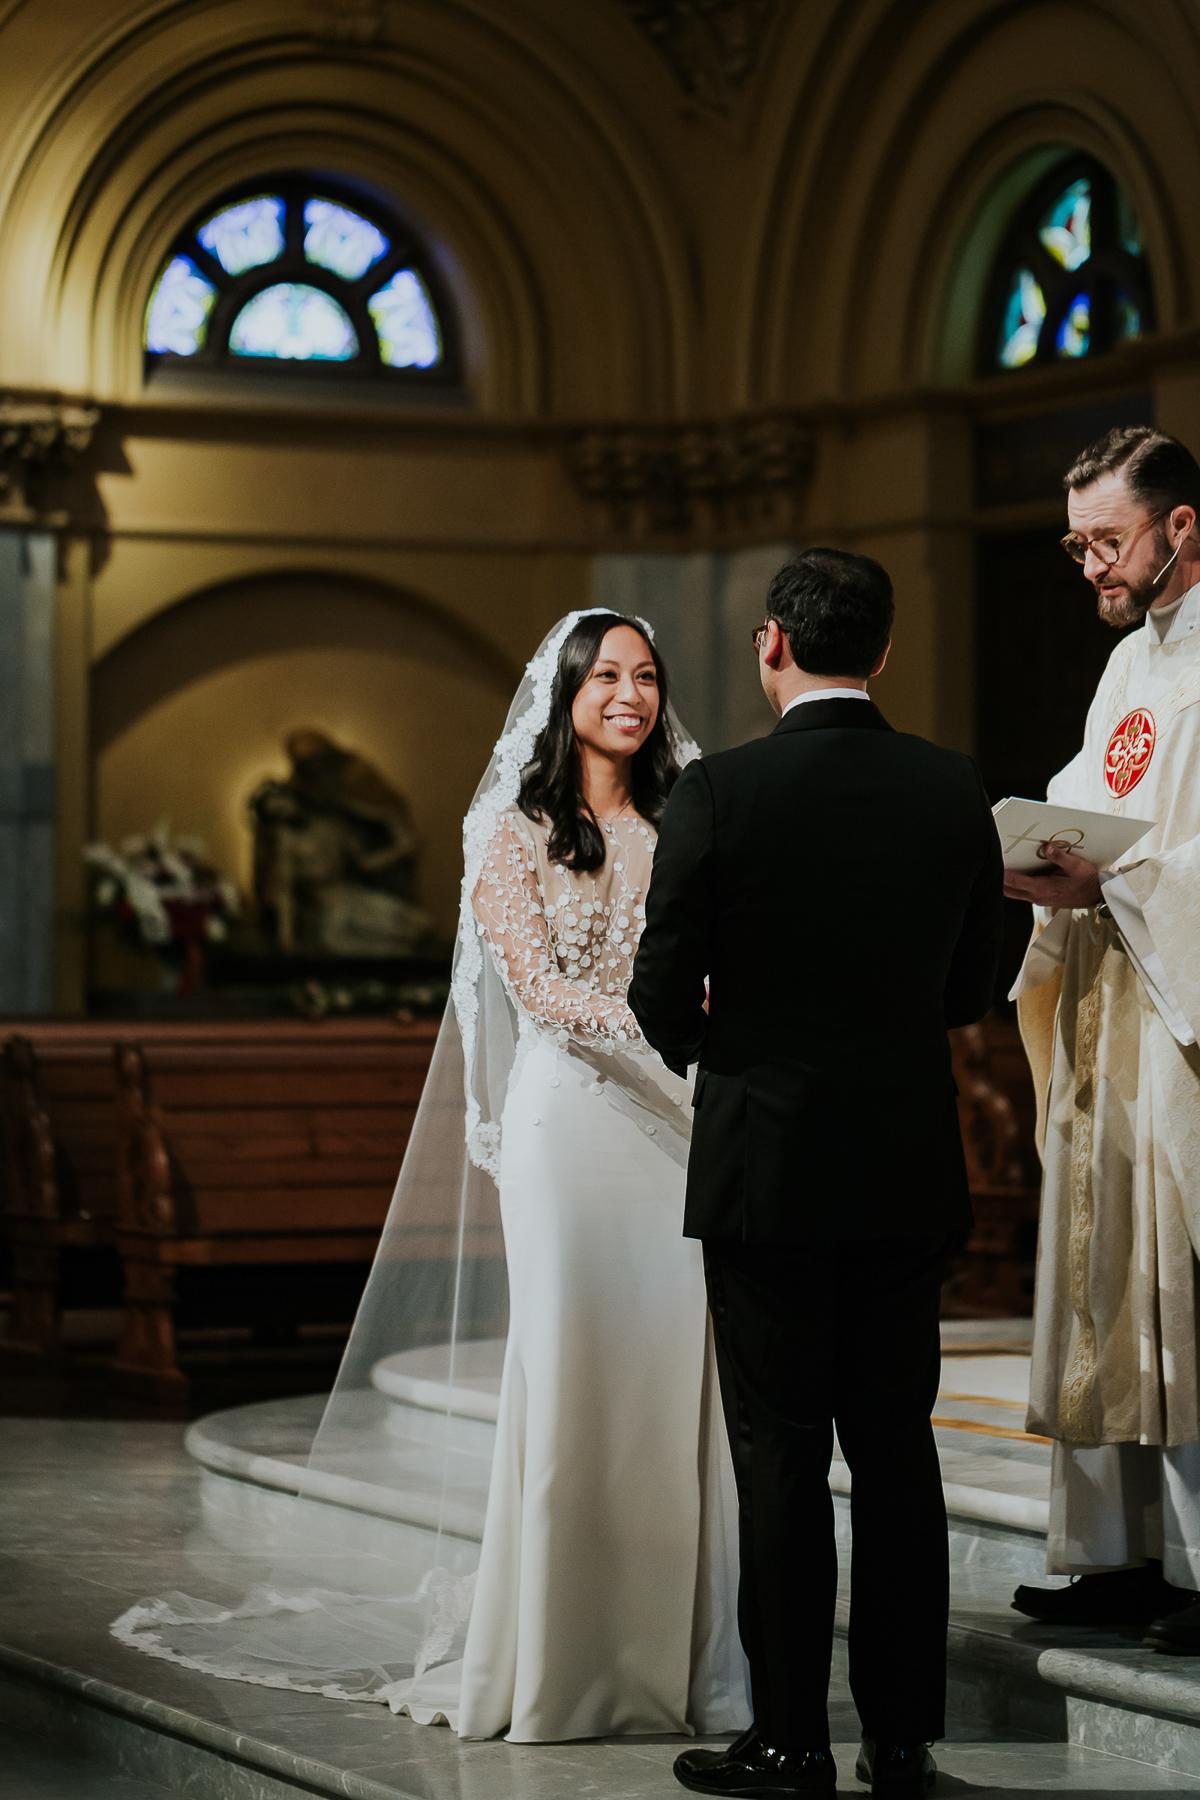 Bowery-Hotel-NYC-Documentary-Wedding-Photos-37.jpg